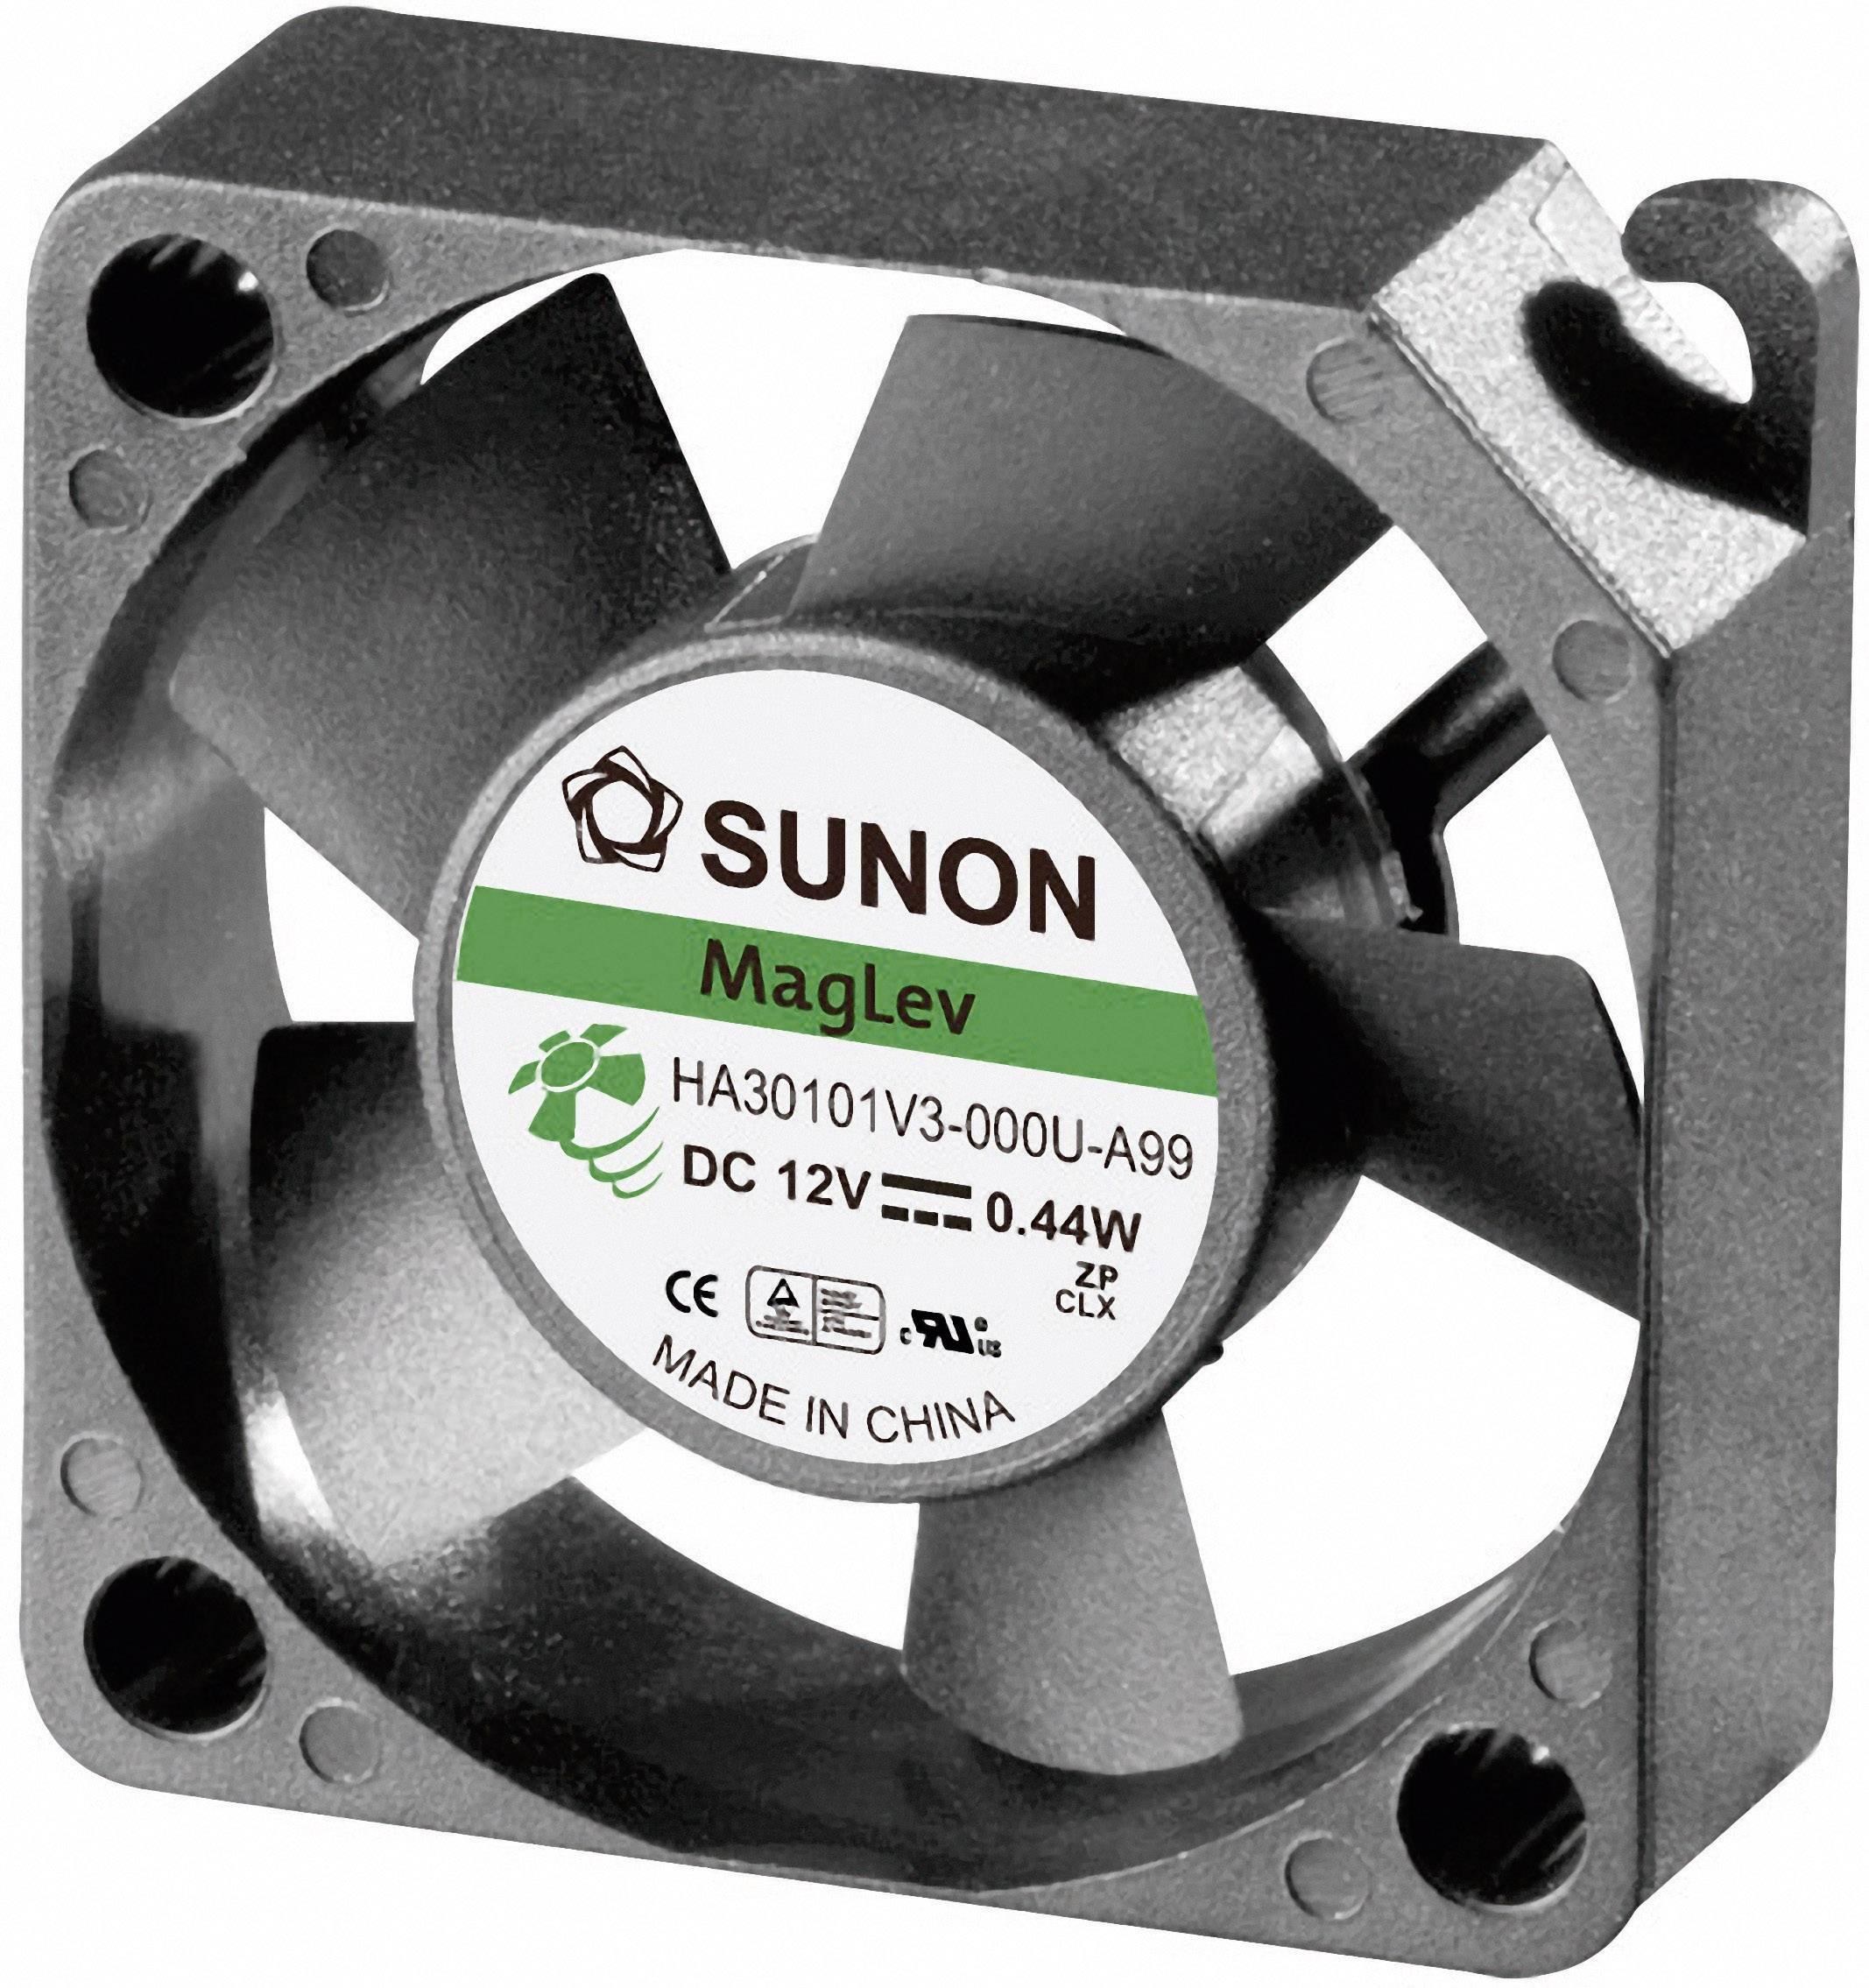 Axiálny ventilátor Sunon HA30101V3-0000-A99 HA30101V3-0000-A99, 12 V/DC, 17.6 dB, (d x š x v) 30 x 30 x 10 mm